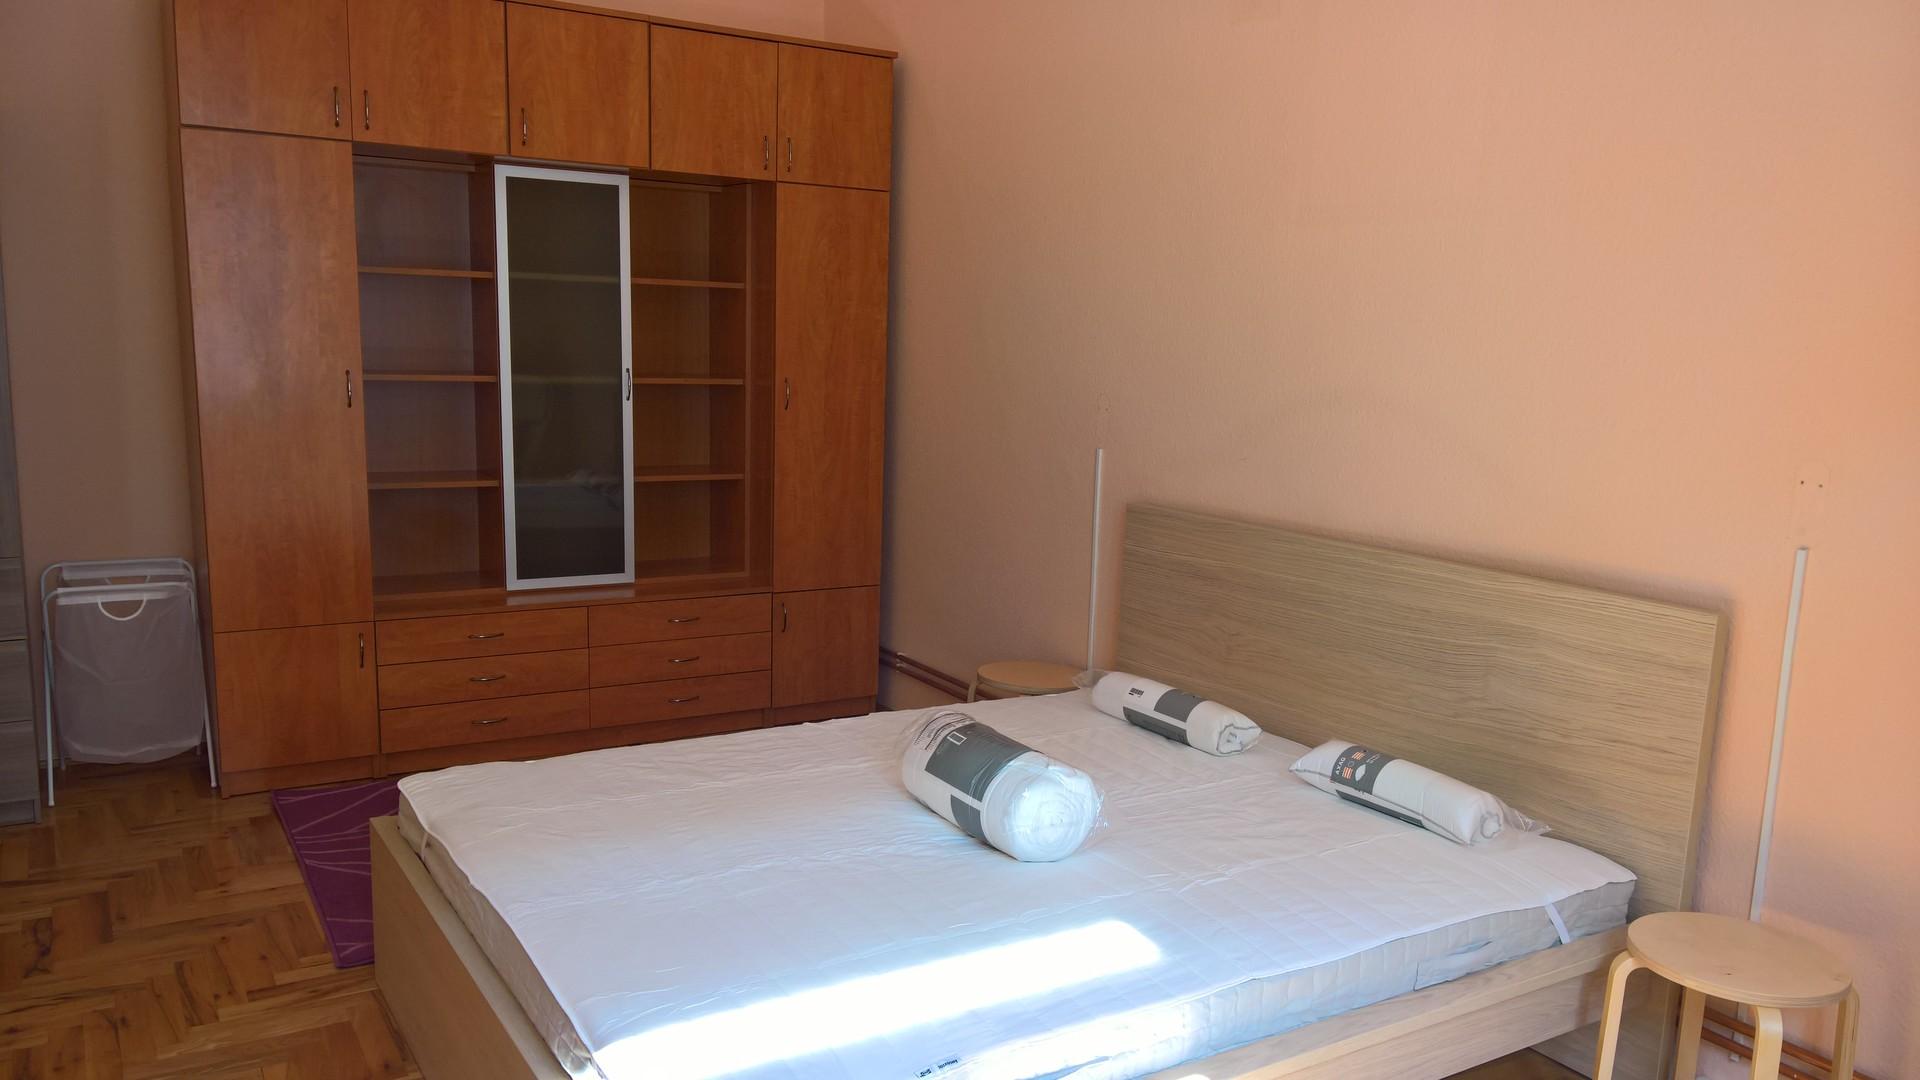 ... 5 BEDROOMS FLAT FOR RENT   BUDAPEST VII District   NYAR Utca 5 ...